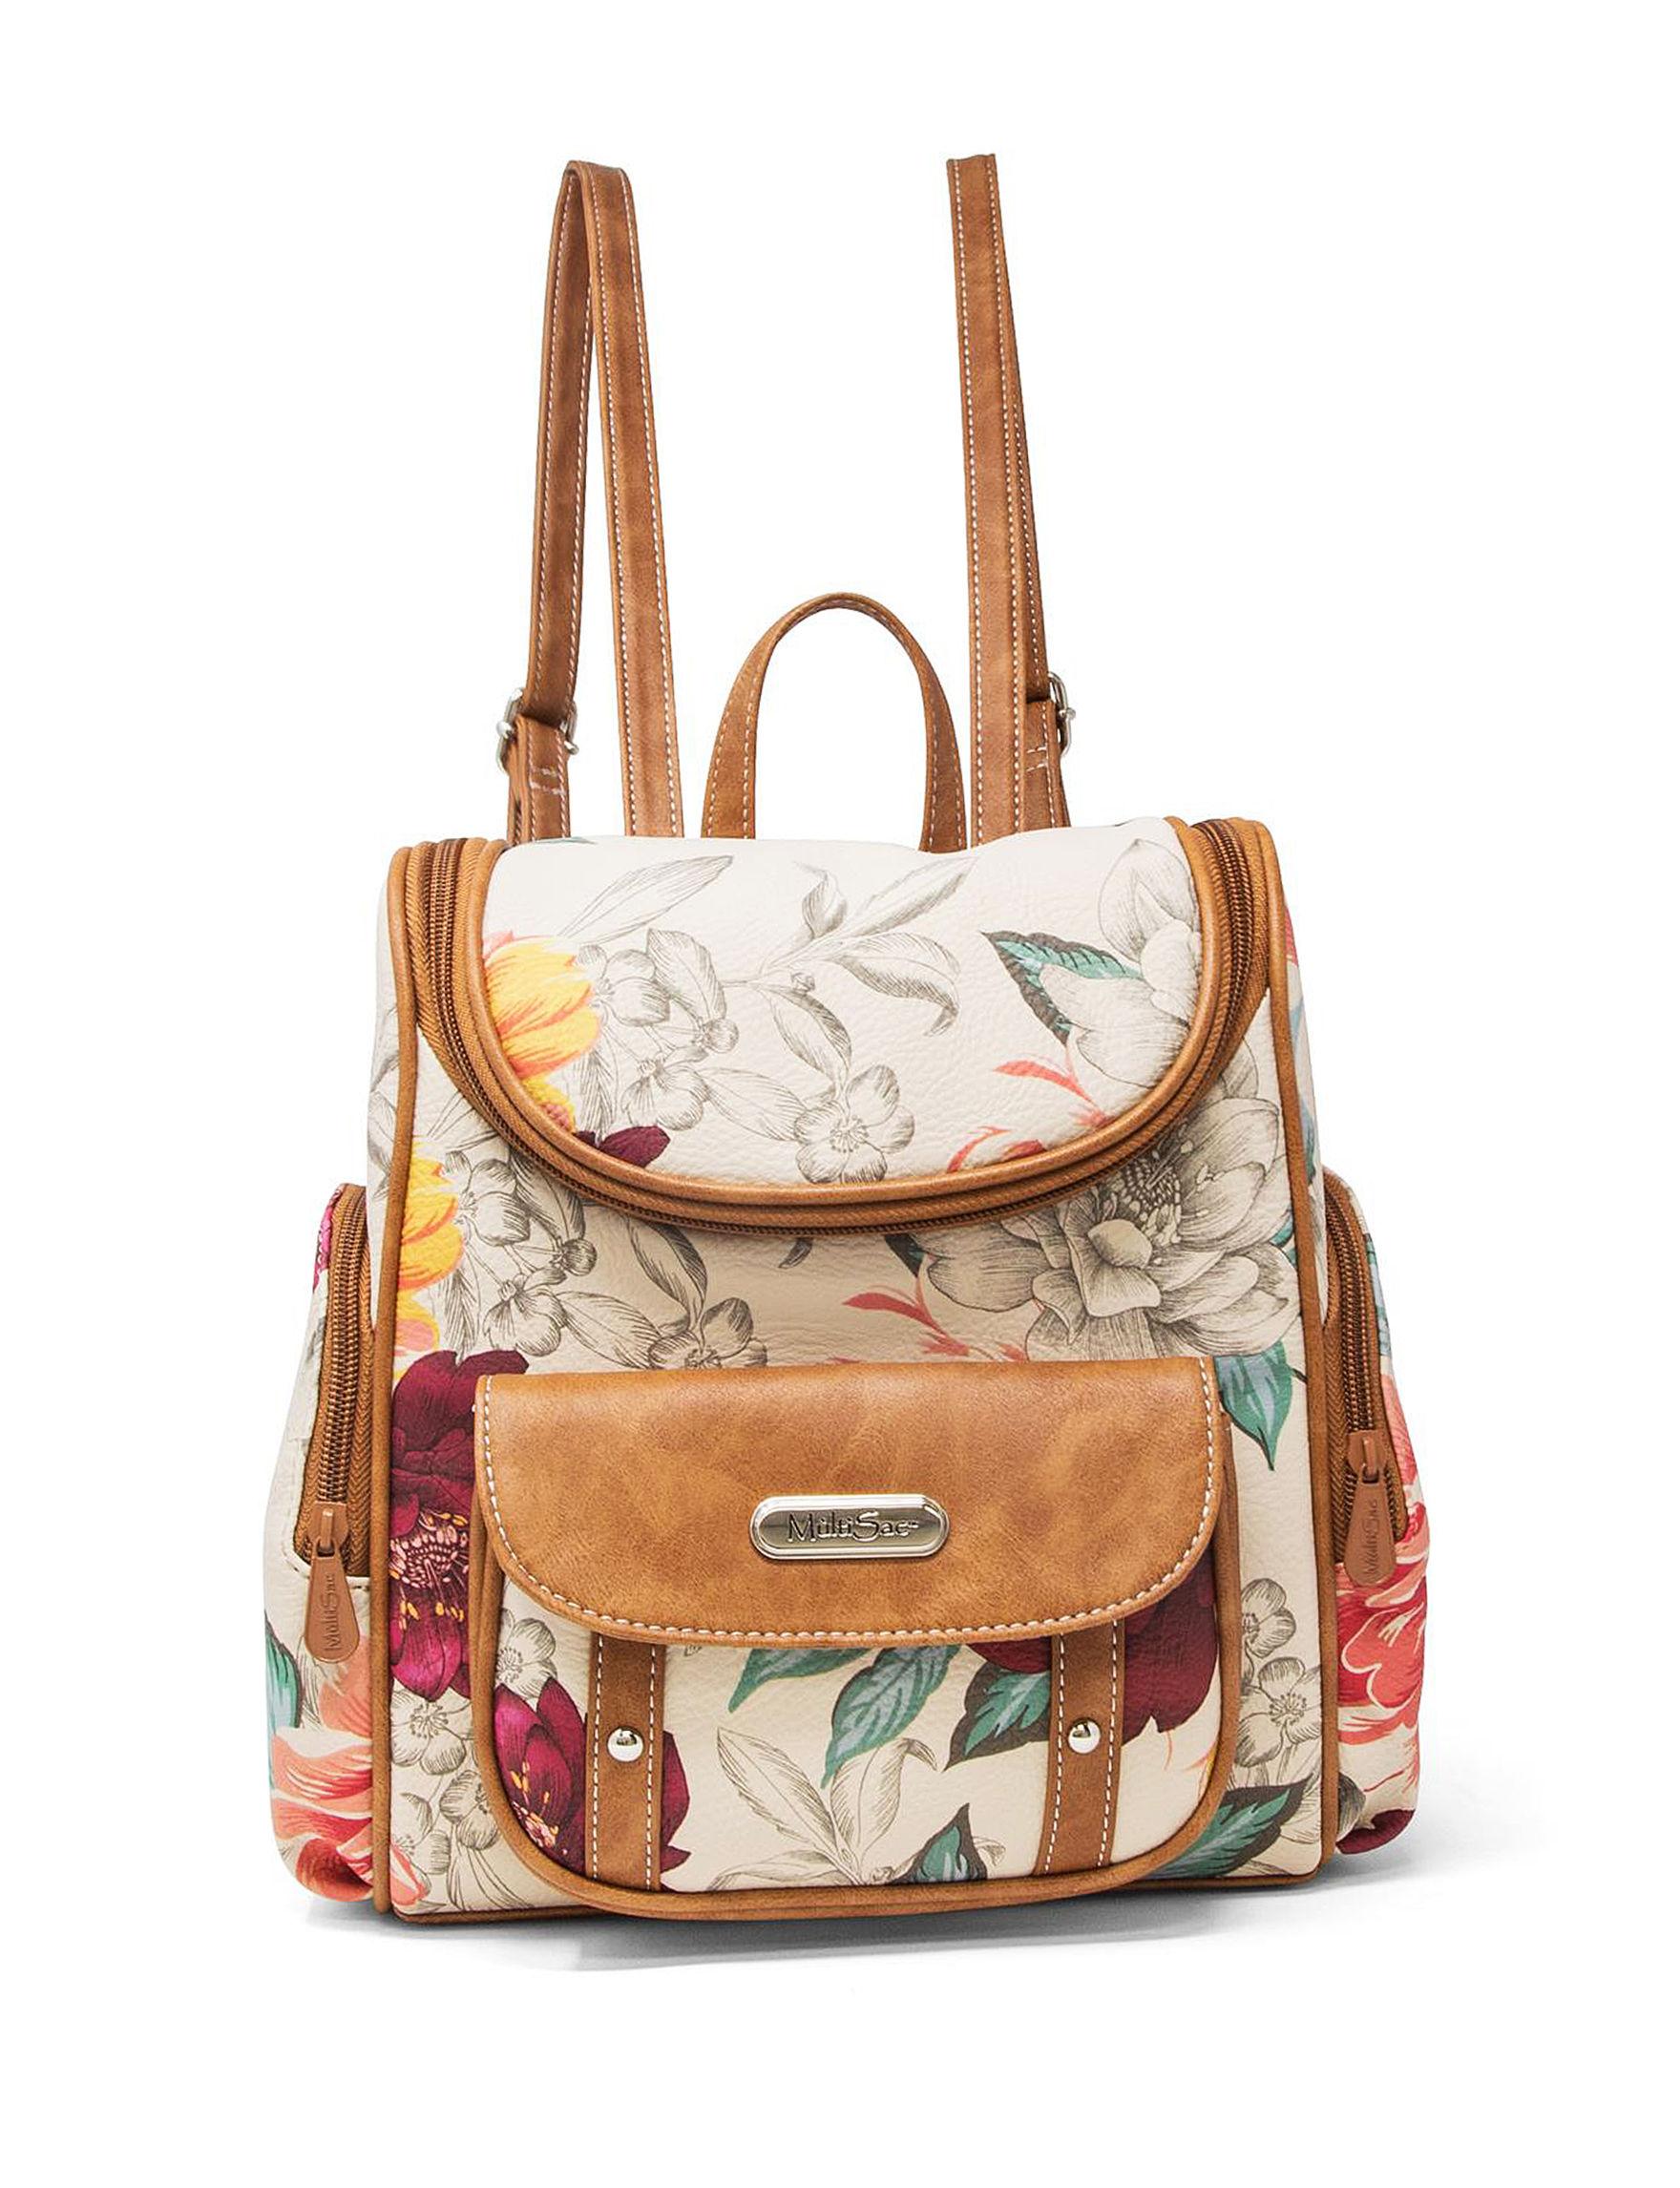 Koltov Beige Floral Bookbags & Backpacks